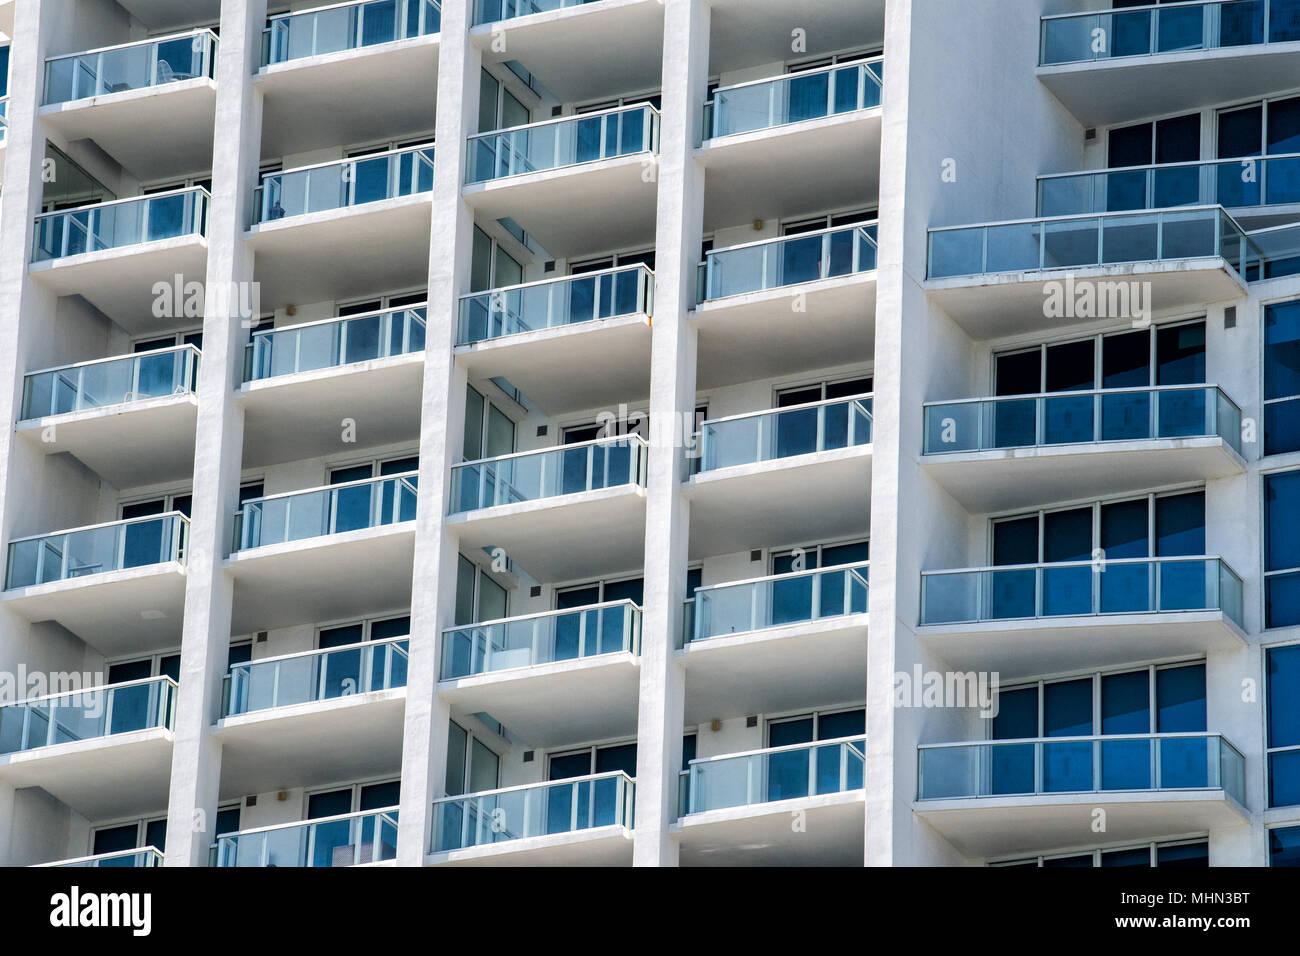 miami beach modern condos apartments on sunny day Stock ...